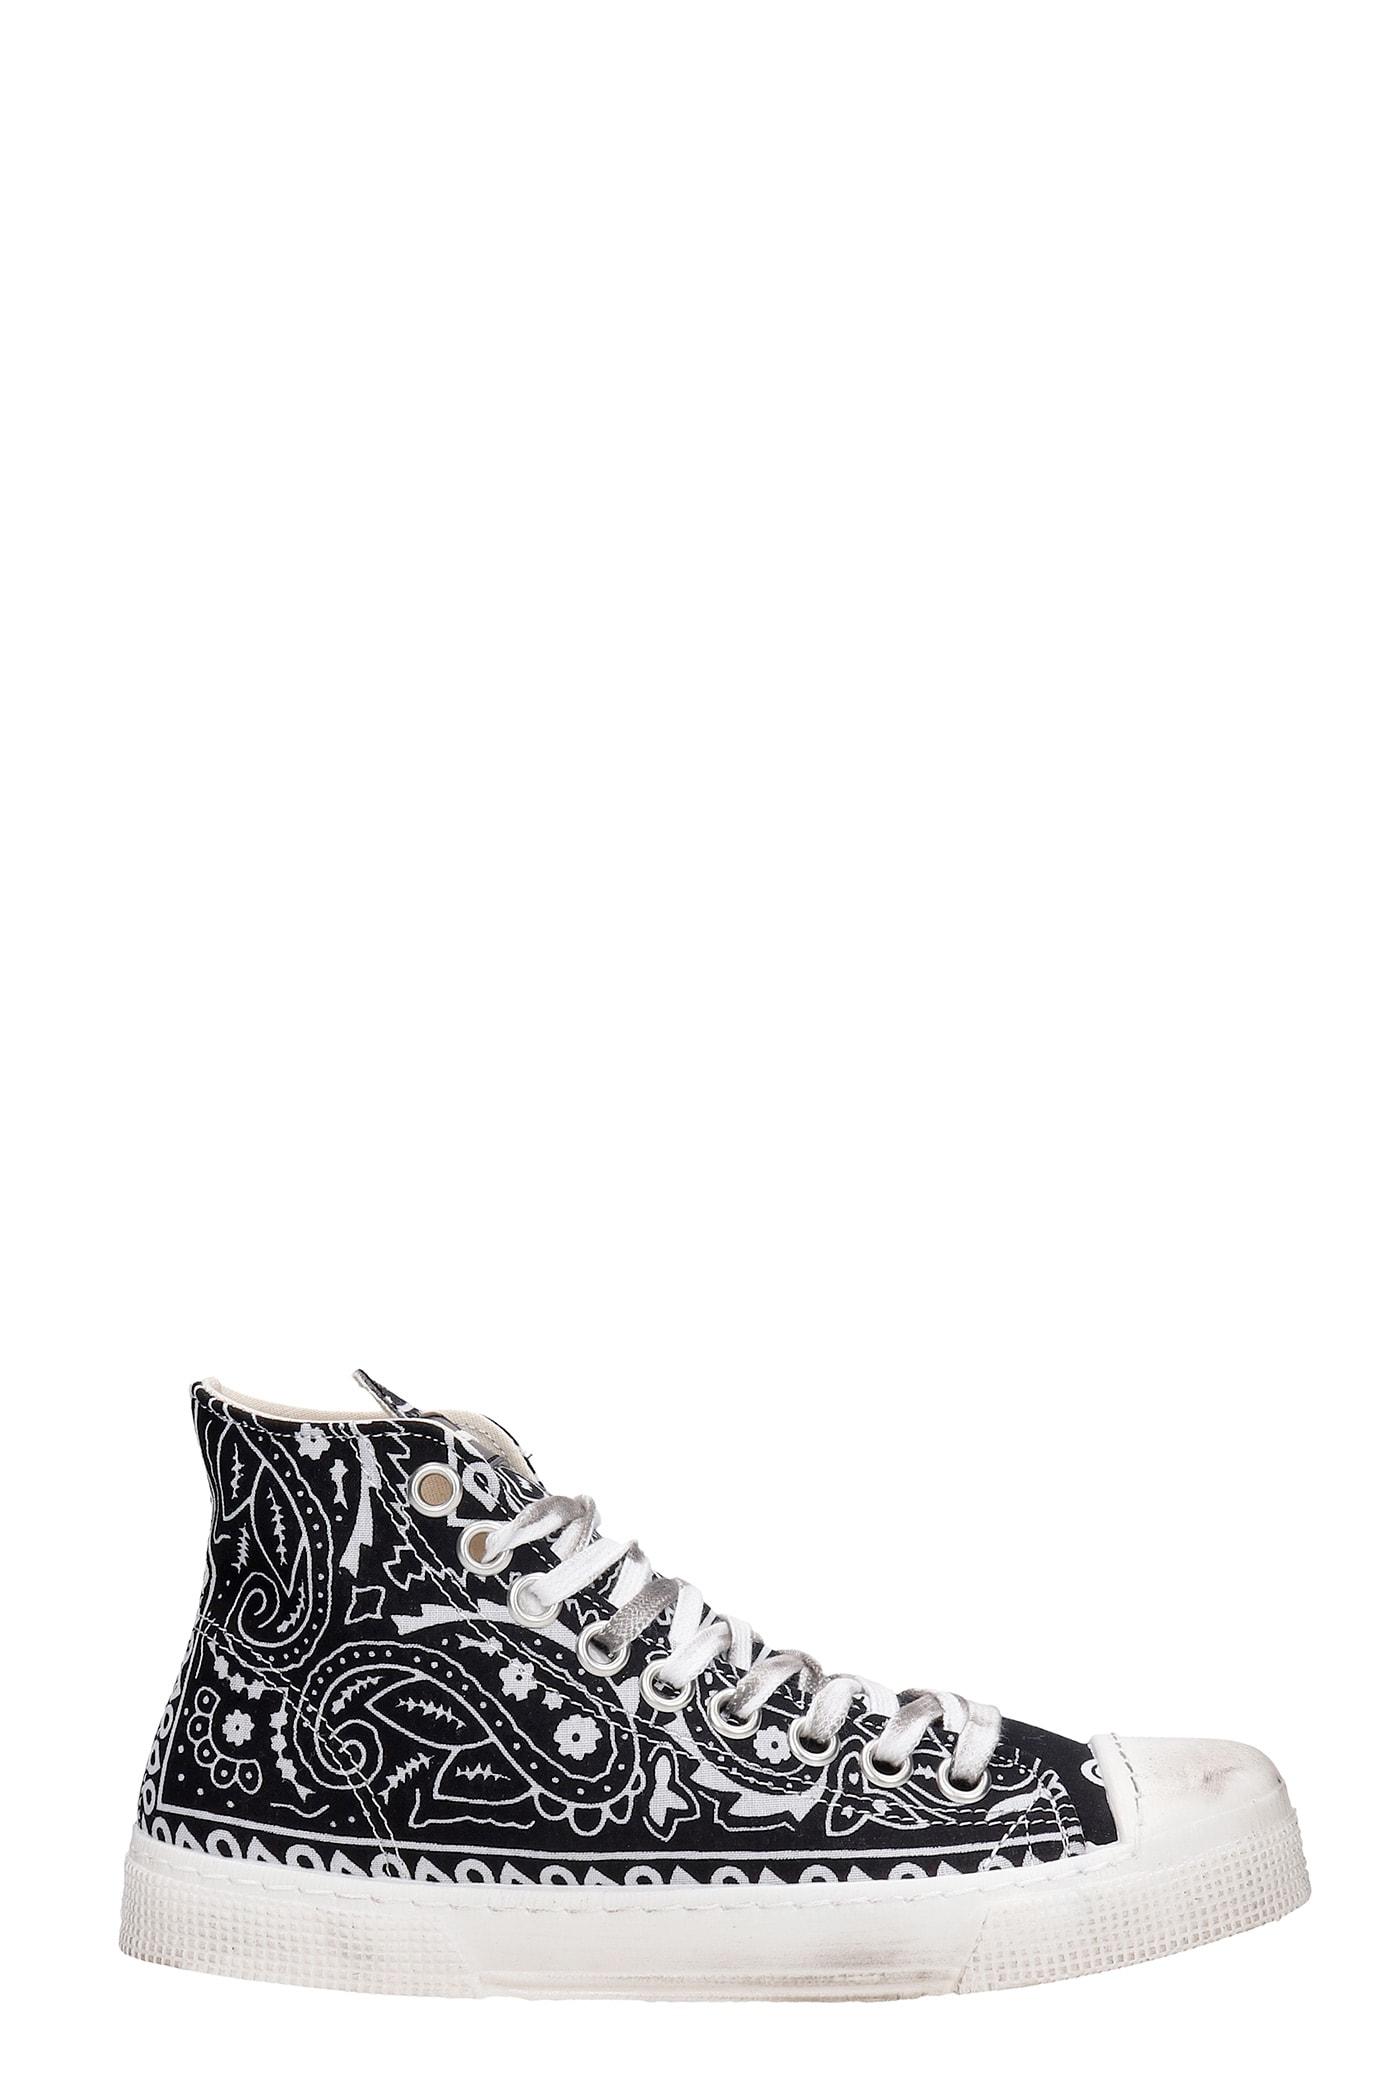 J.m High Sneakers In Black Synthetic Fibers